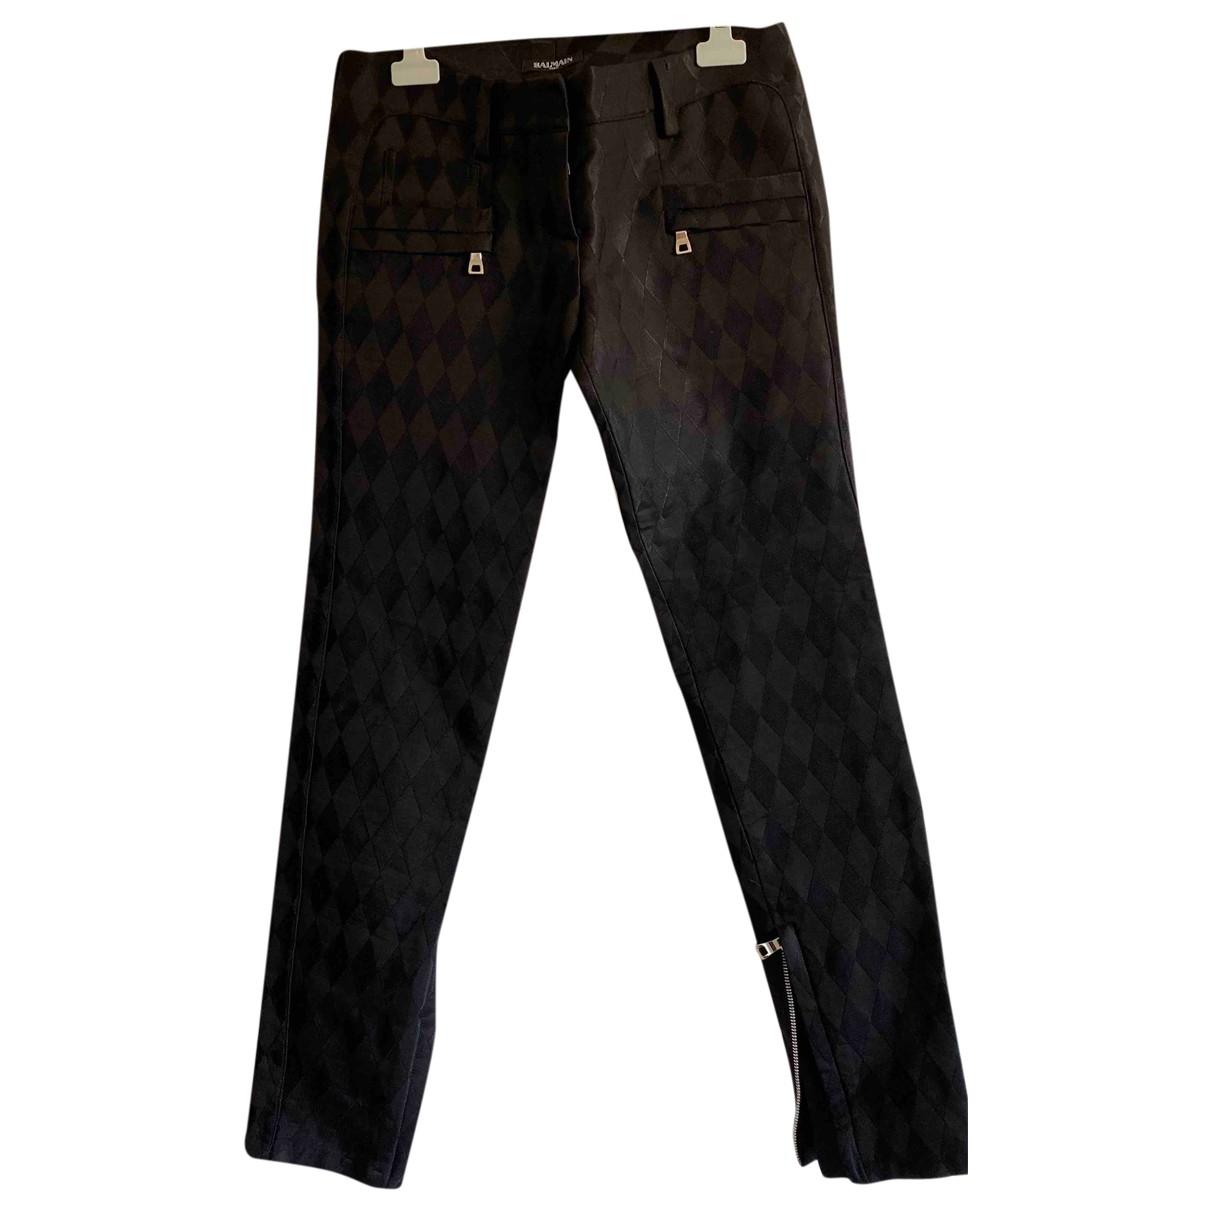 Balmain \N Black Trousers for Women 34 FR